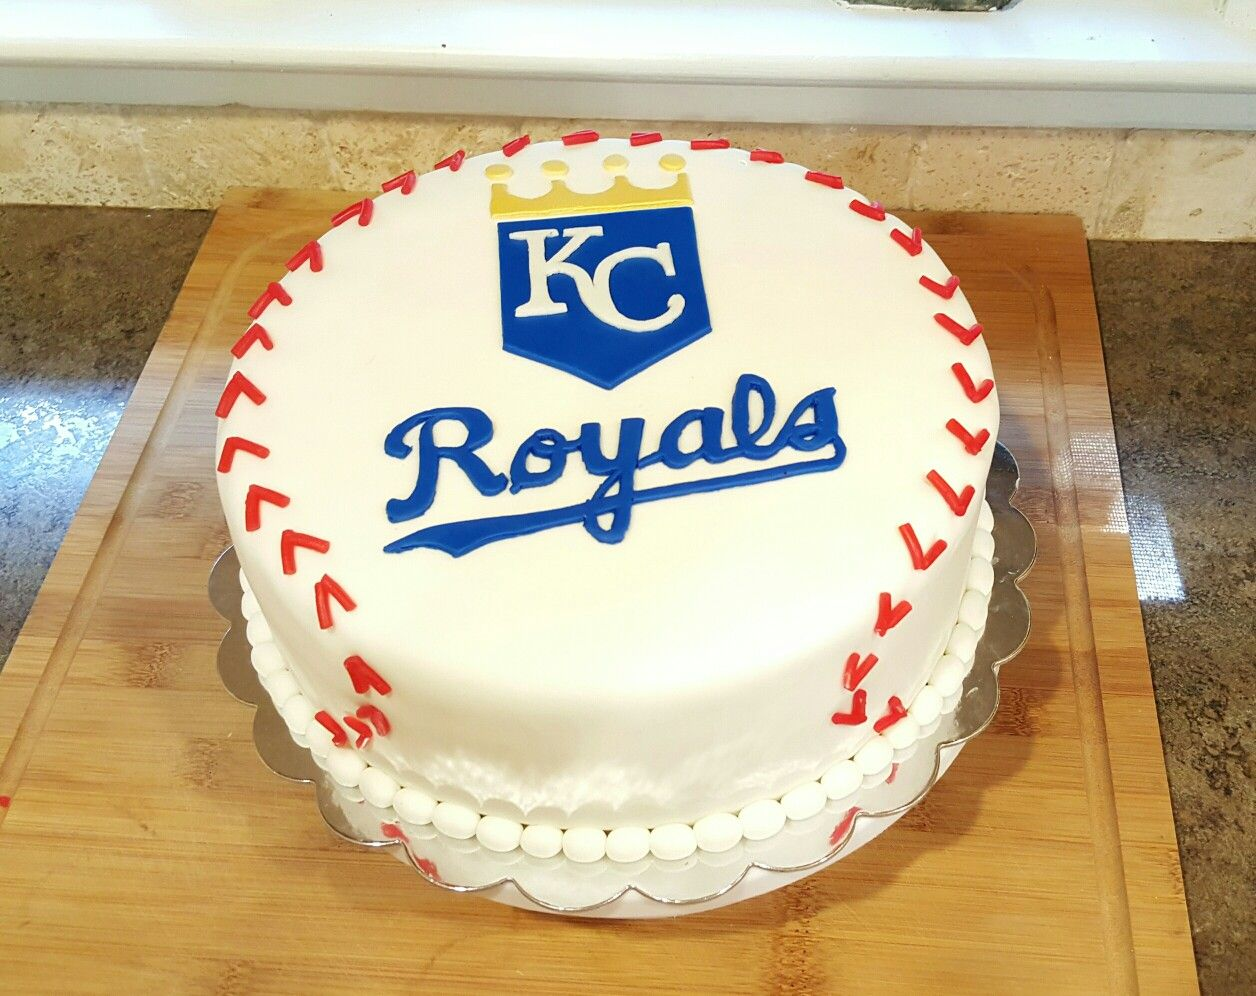 Astonishing Kansas City Royals Fondant Cake Baseball Birthday Cakes Cake Funny Birthday Cards Online Elaedamsfinfo